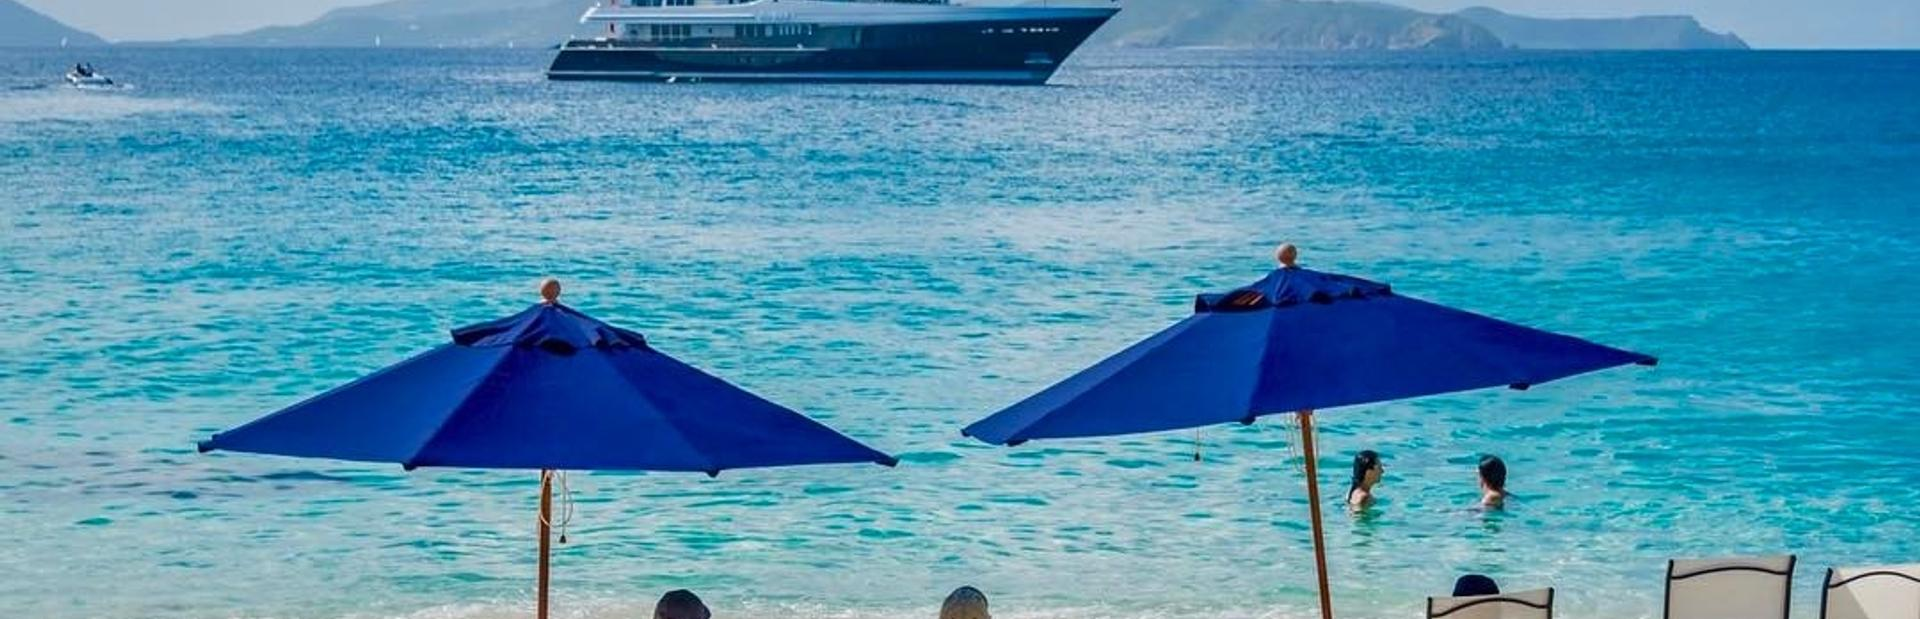 Bumper Caribbean yacht charter season predicted as Coronavirus travel restrictions relax